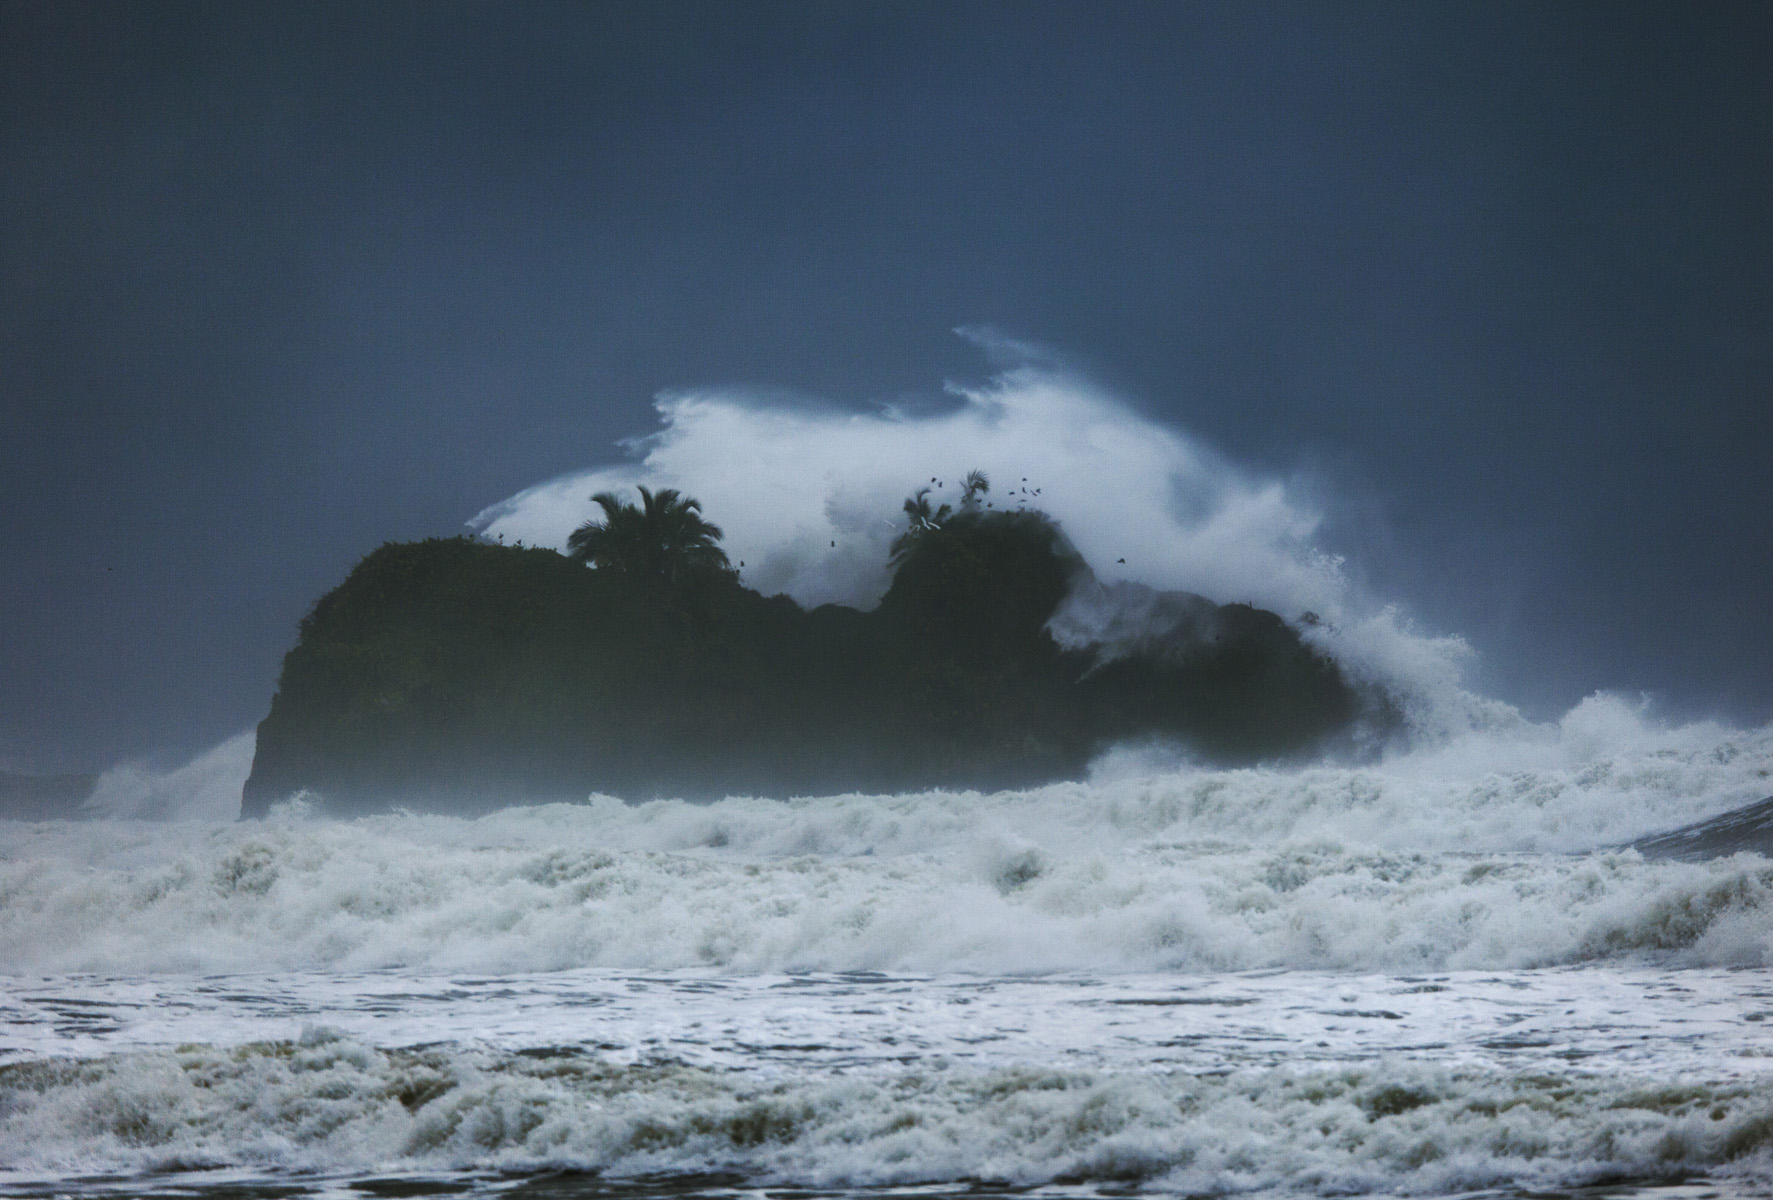 Pretty wild waves